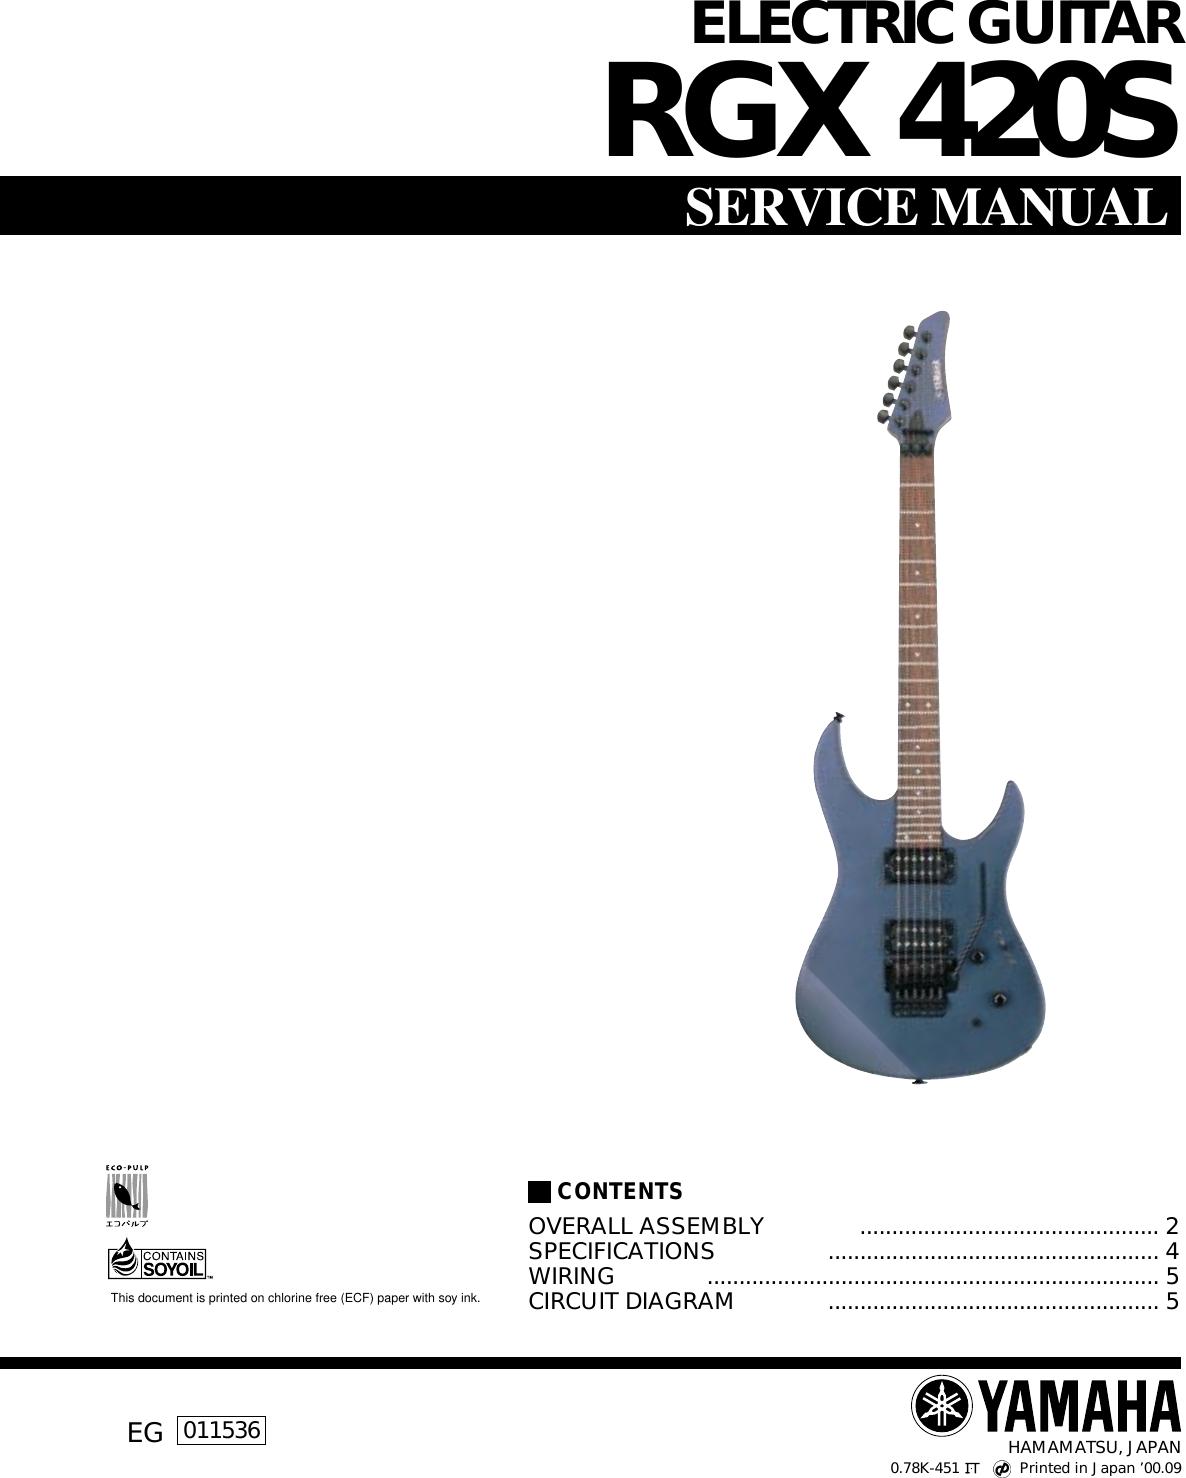 Yamaha Rgx 420s Users Manual Fender Guitar Manuals Parts B Wiring Diagram S Schematics